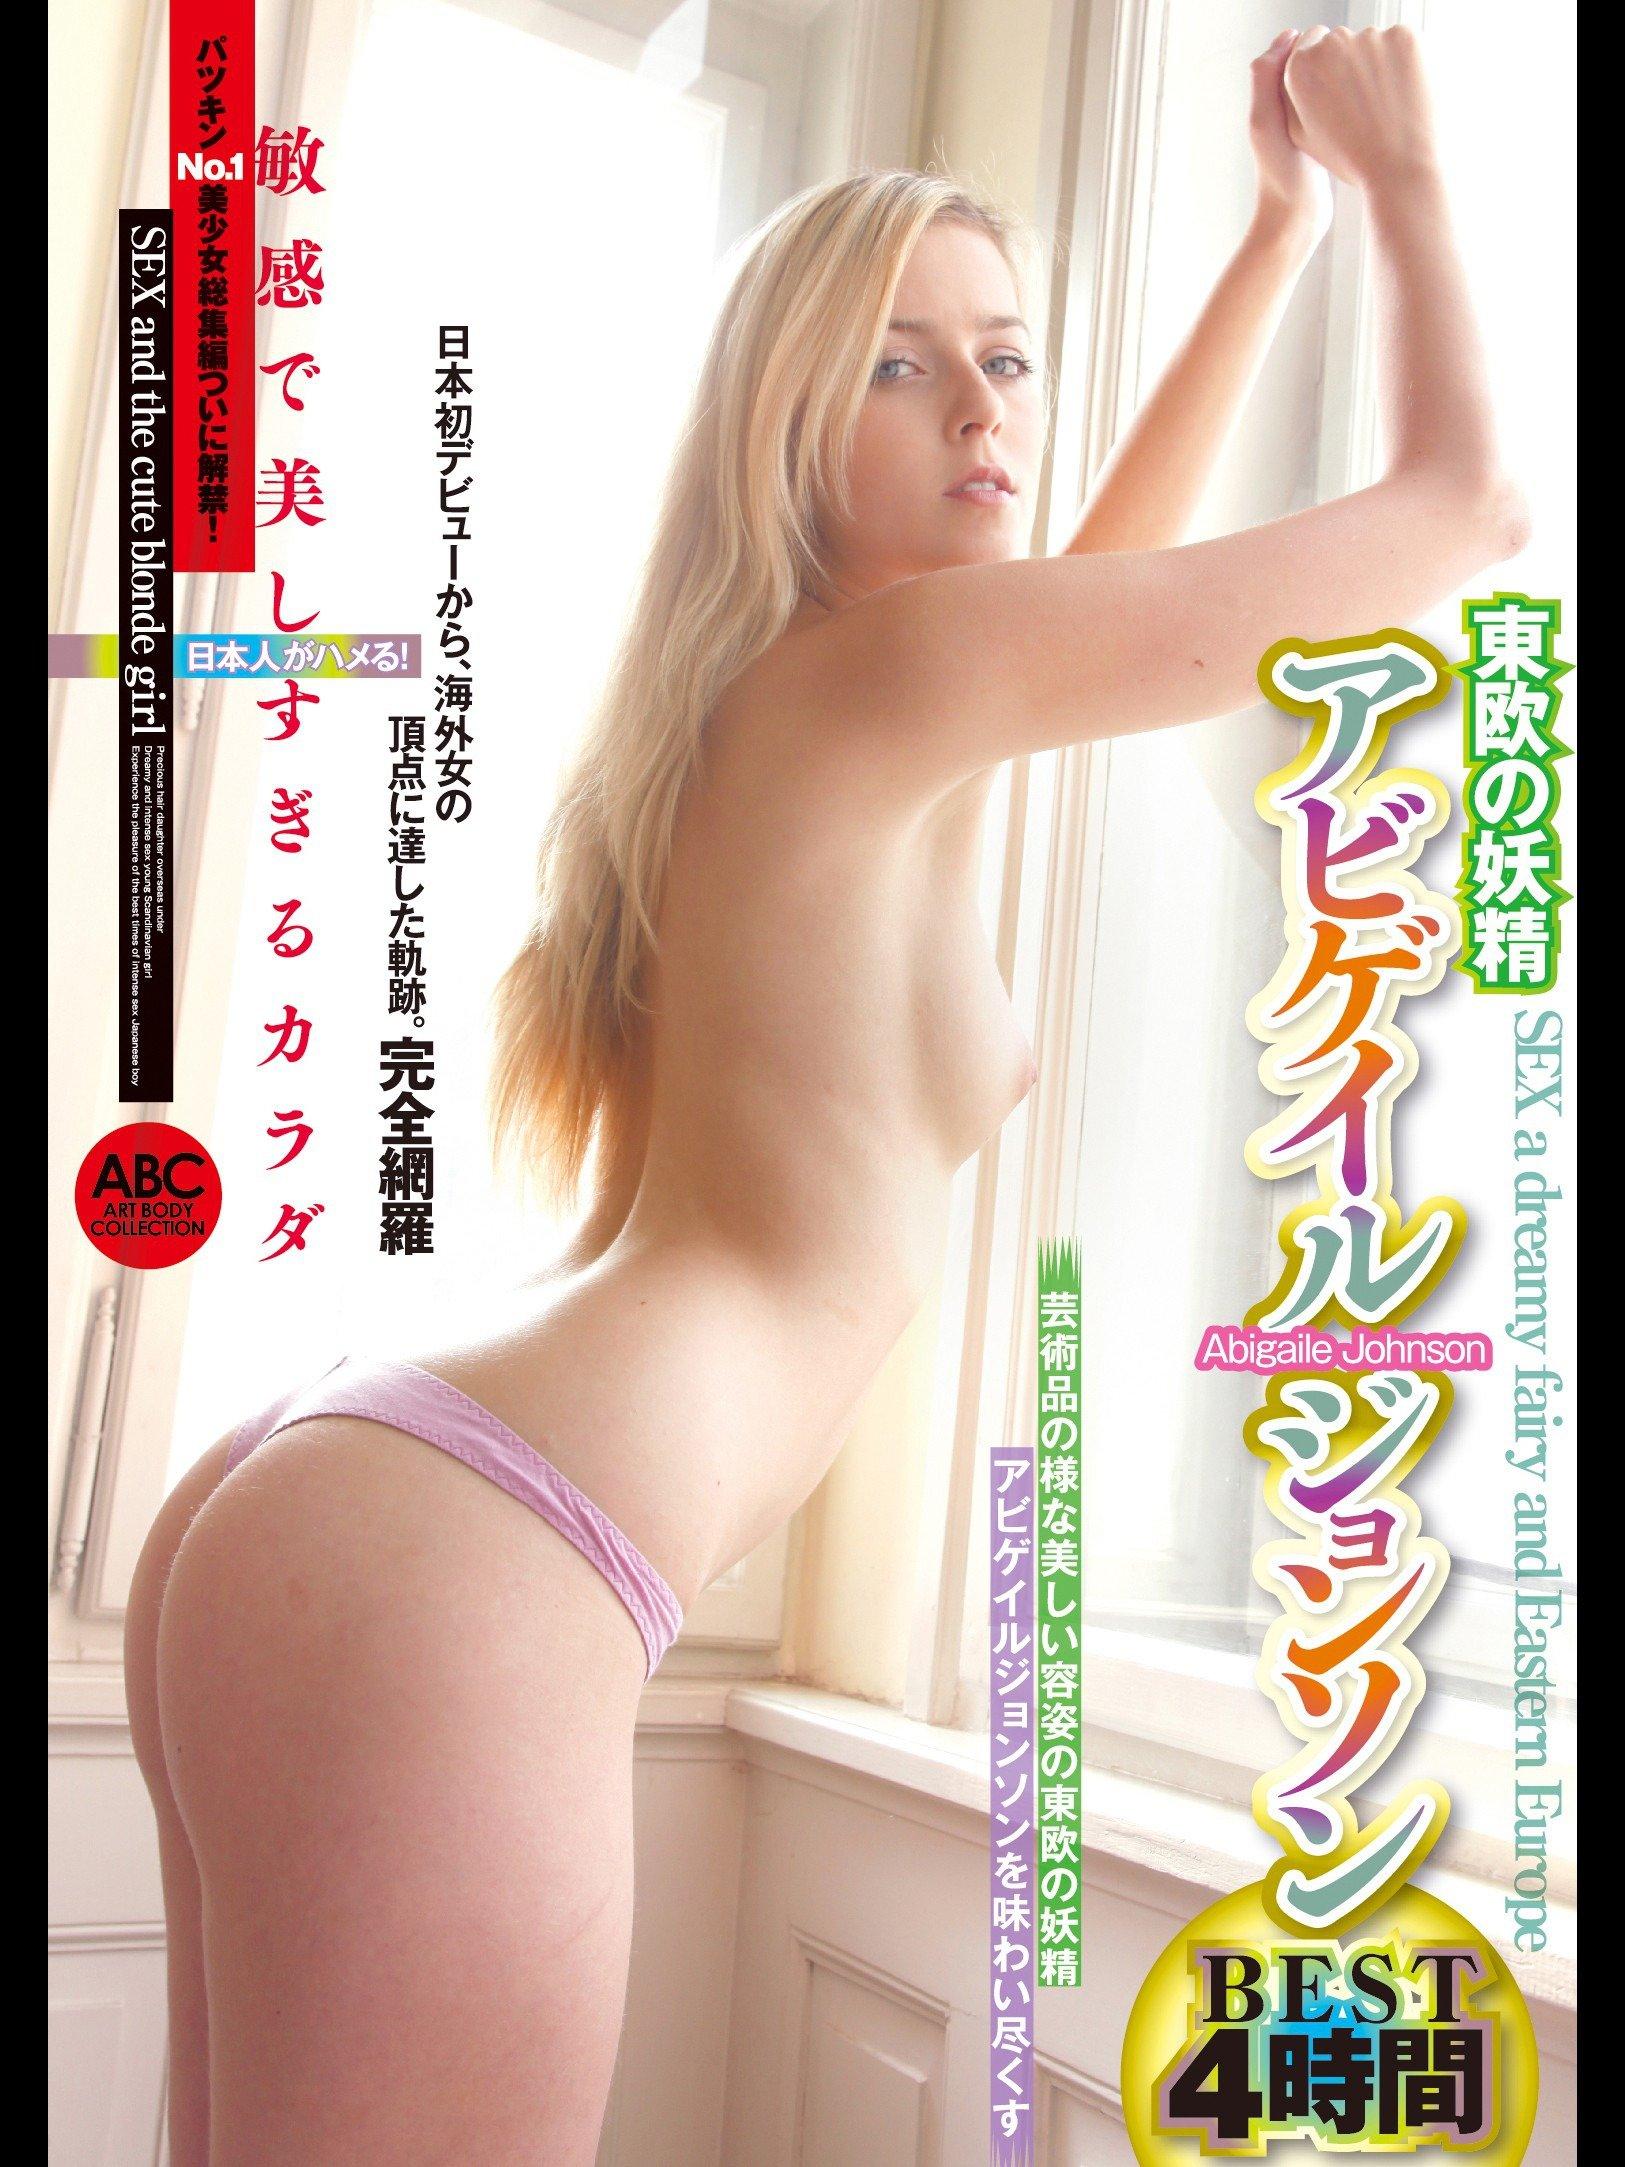 Amazon.co.jp: 日本人がハメる!東欧の妖精アビゲイルジョンソン -zabgirlsss.edu.bd